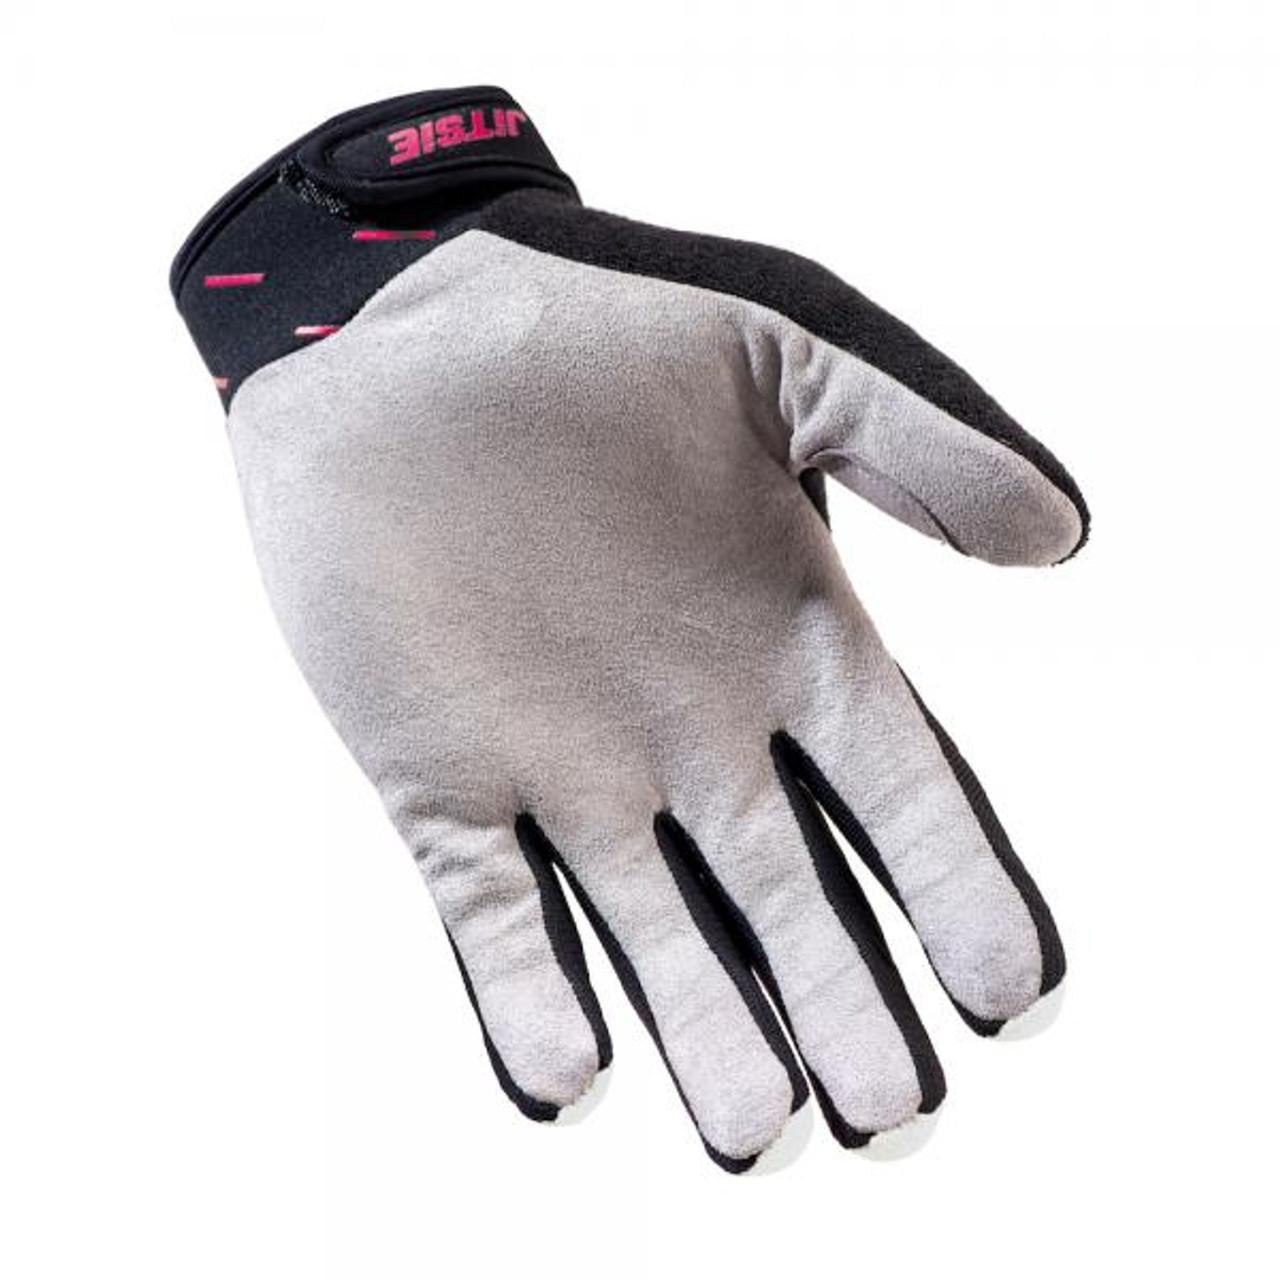 Gloves Domino,white/ teal/ purple